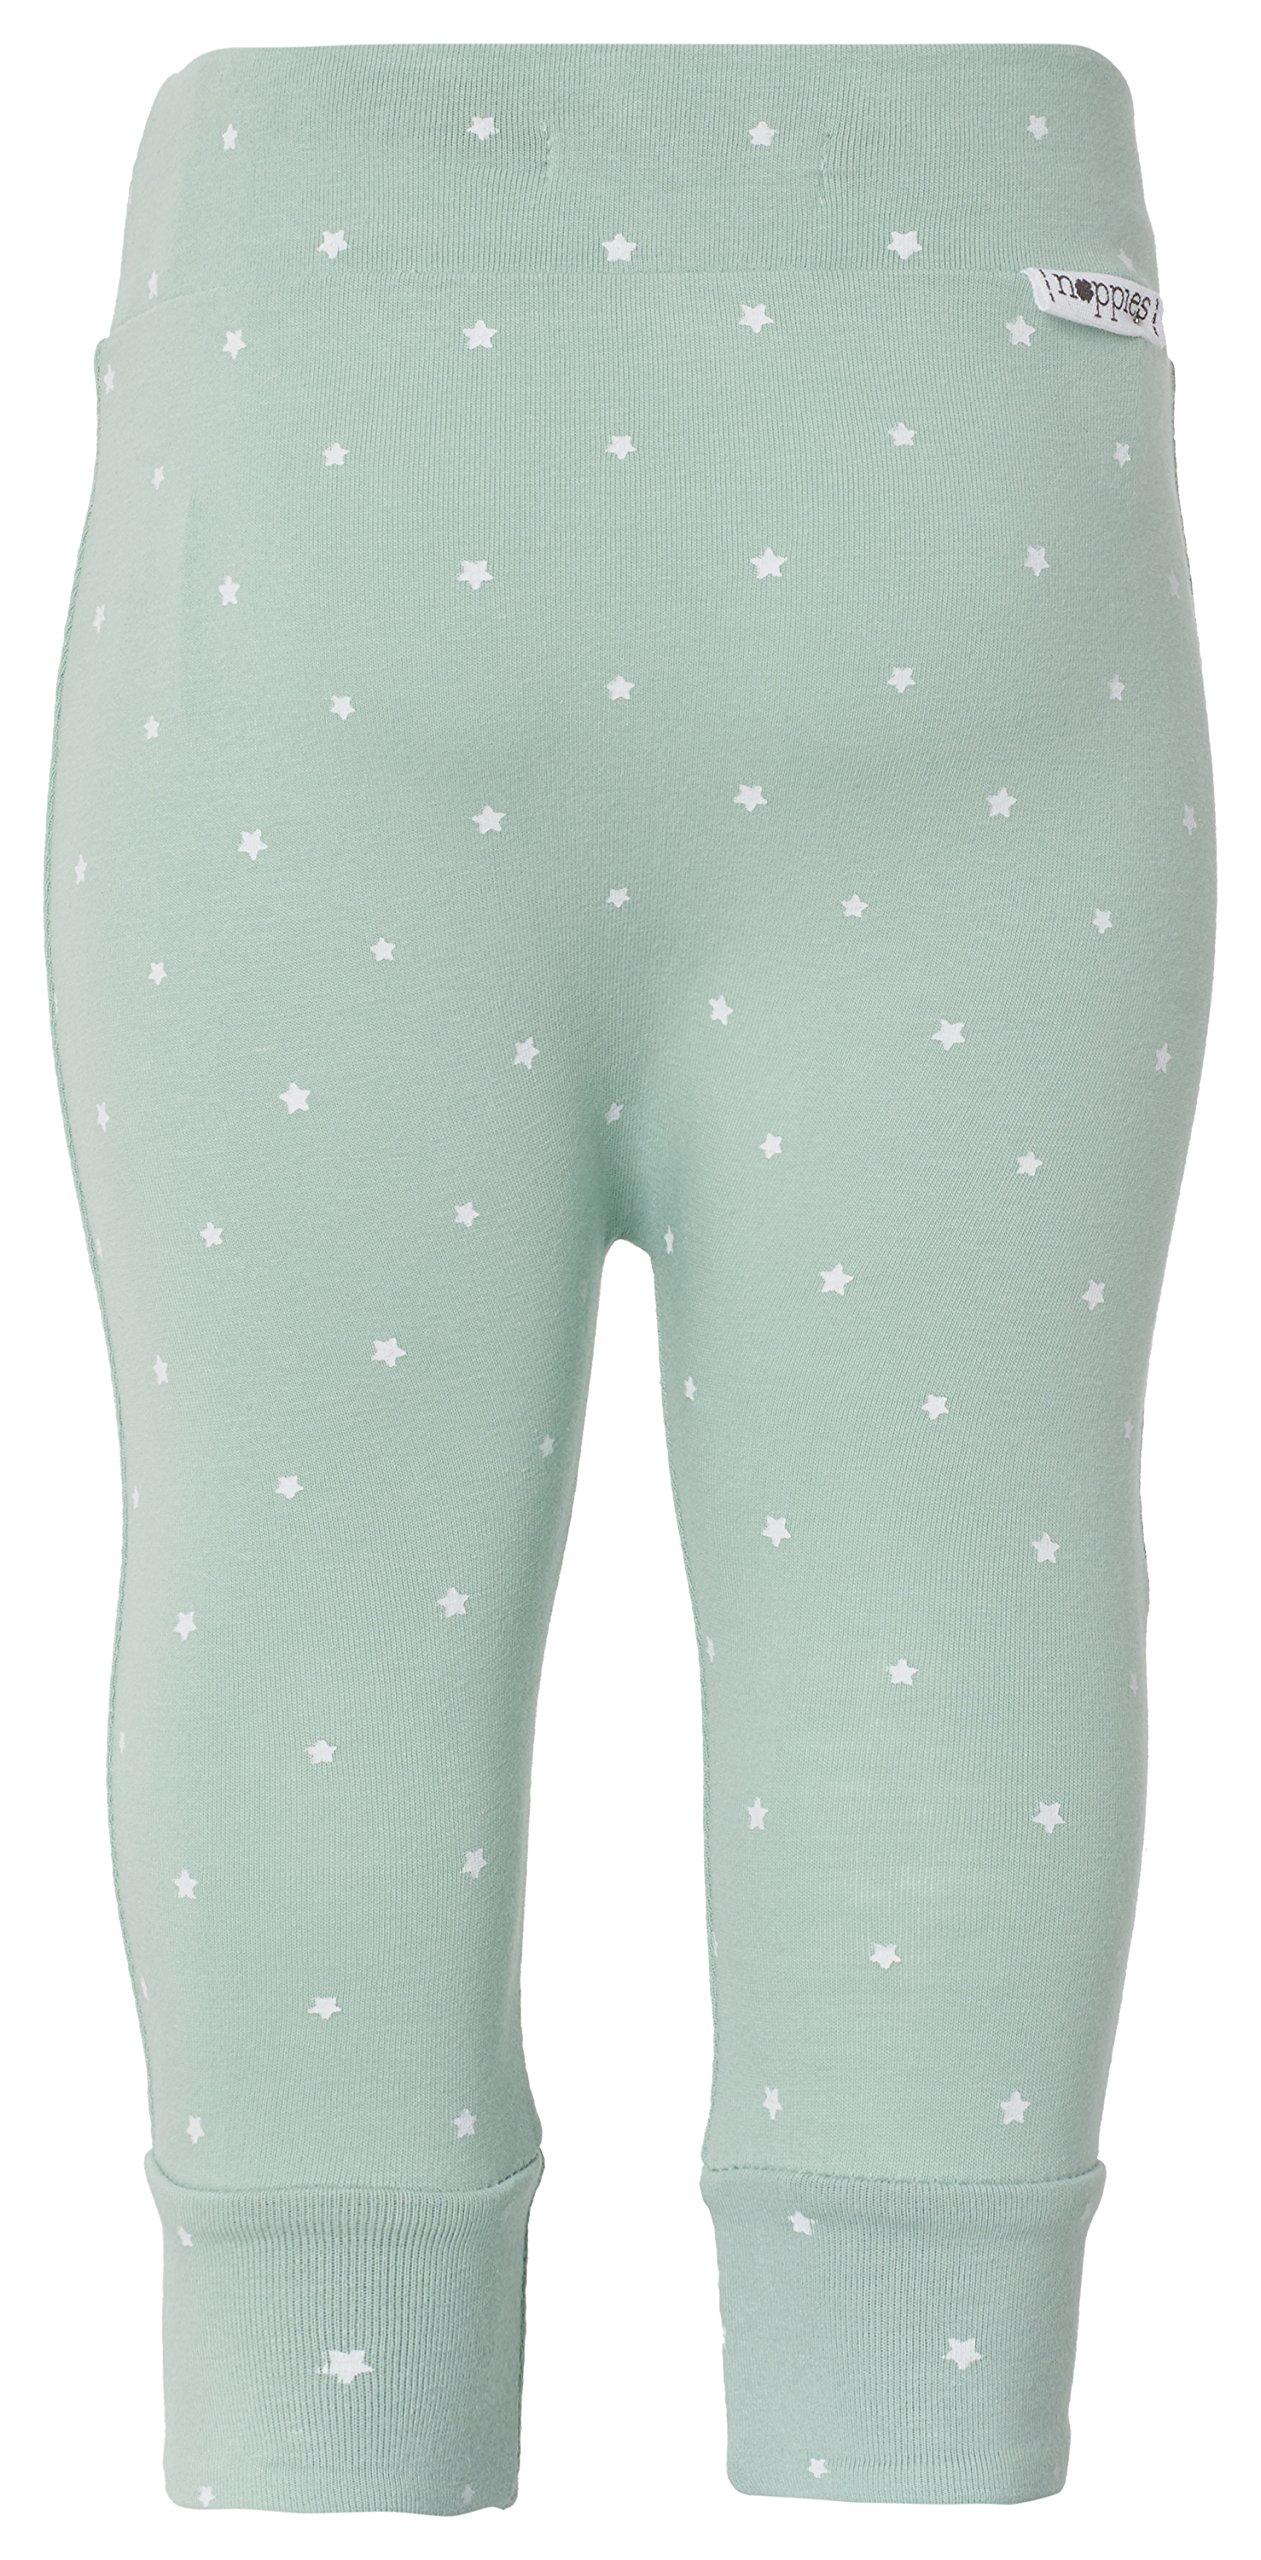 Noppies U Pants Jrsy Comfort Bo Pantalones Unisex bebé 2